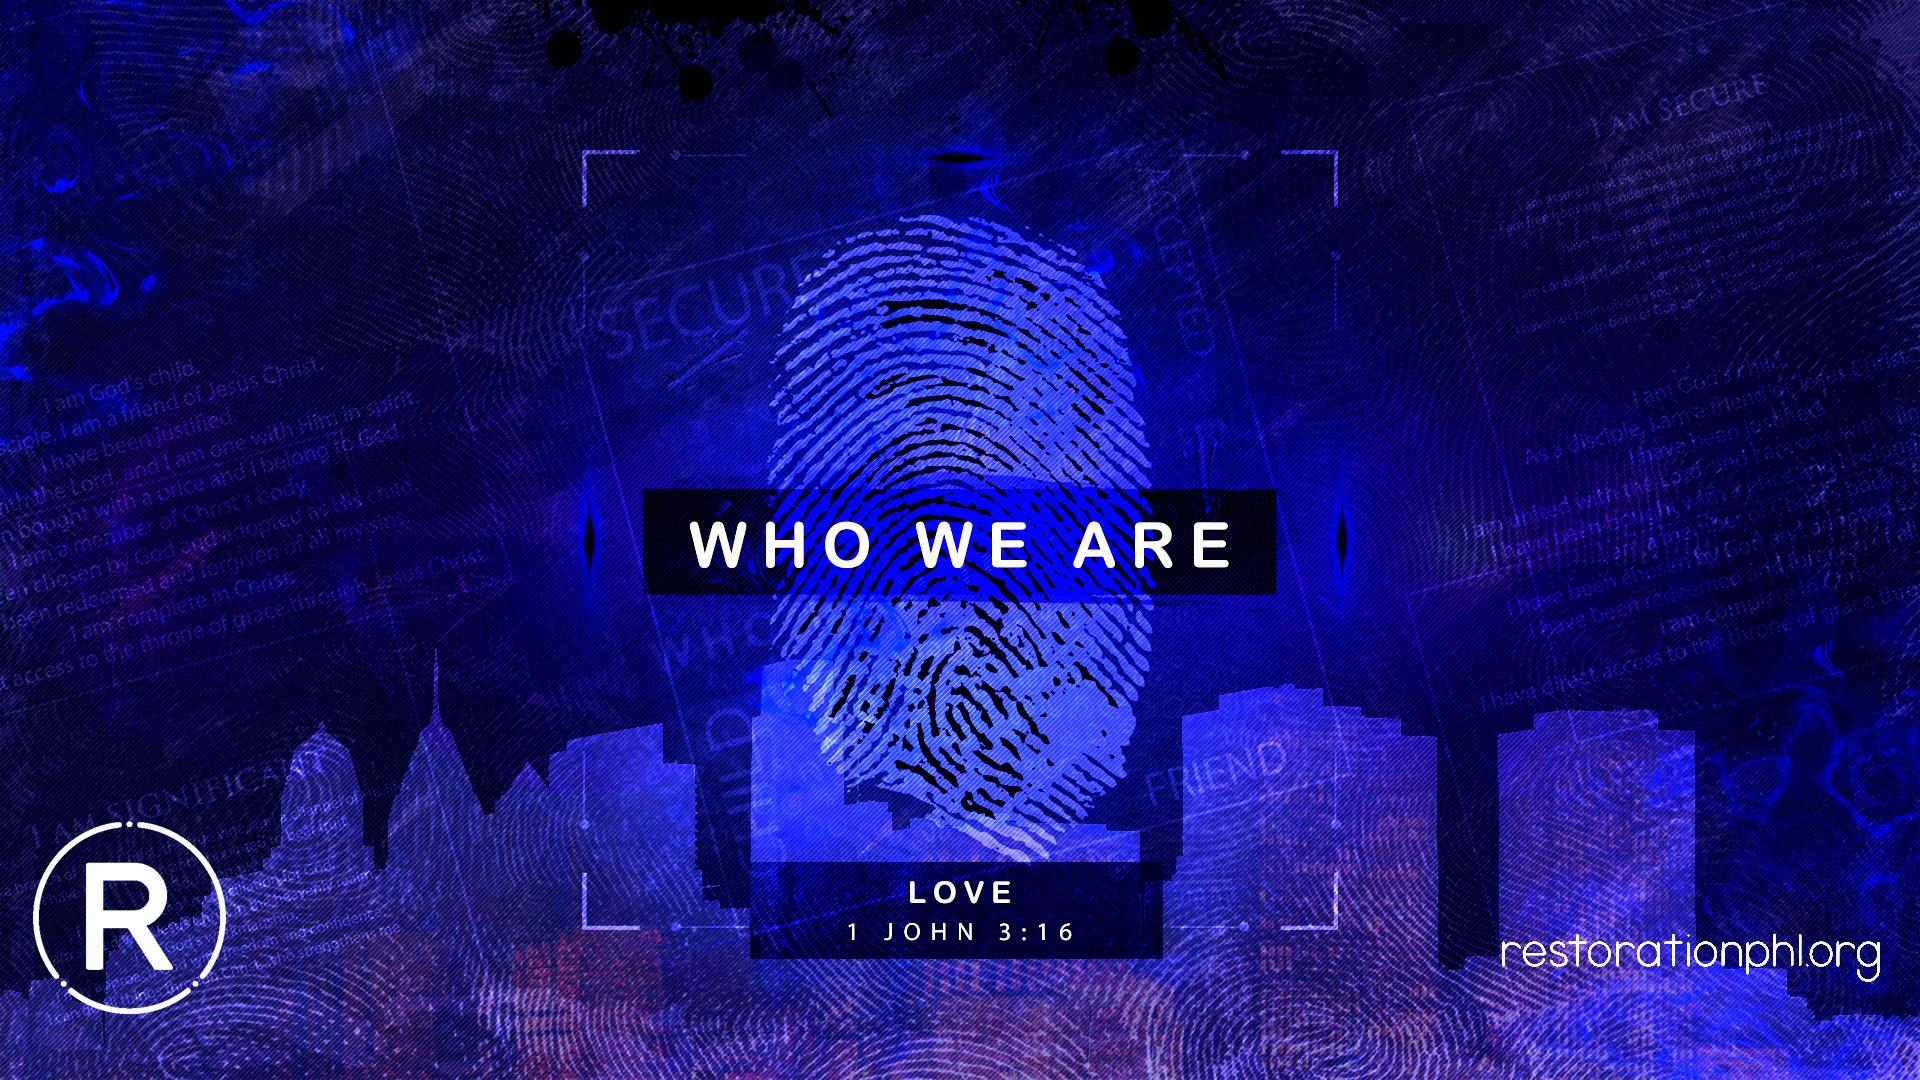 Who We Are-1John316.jpg